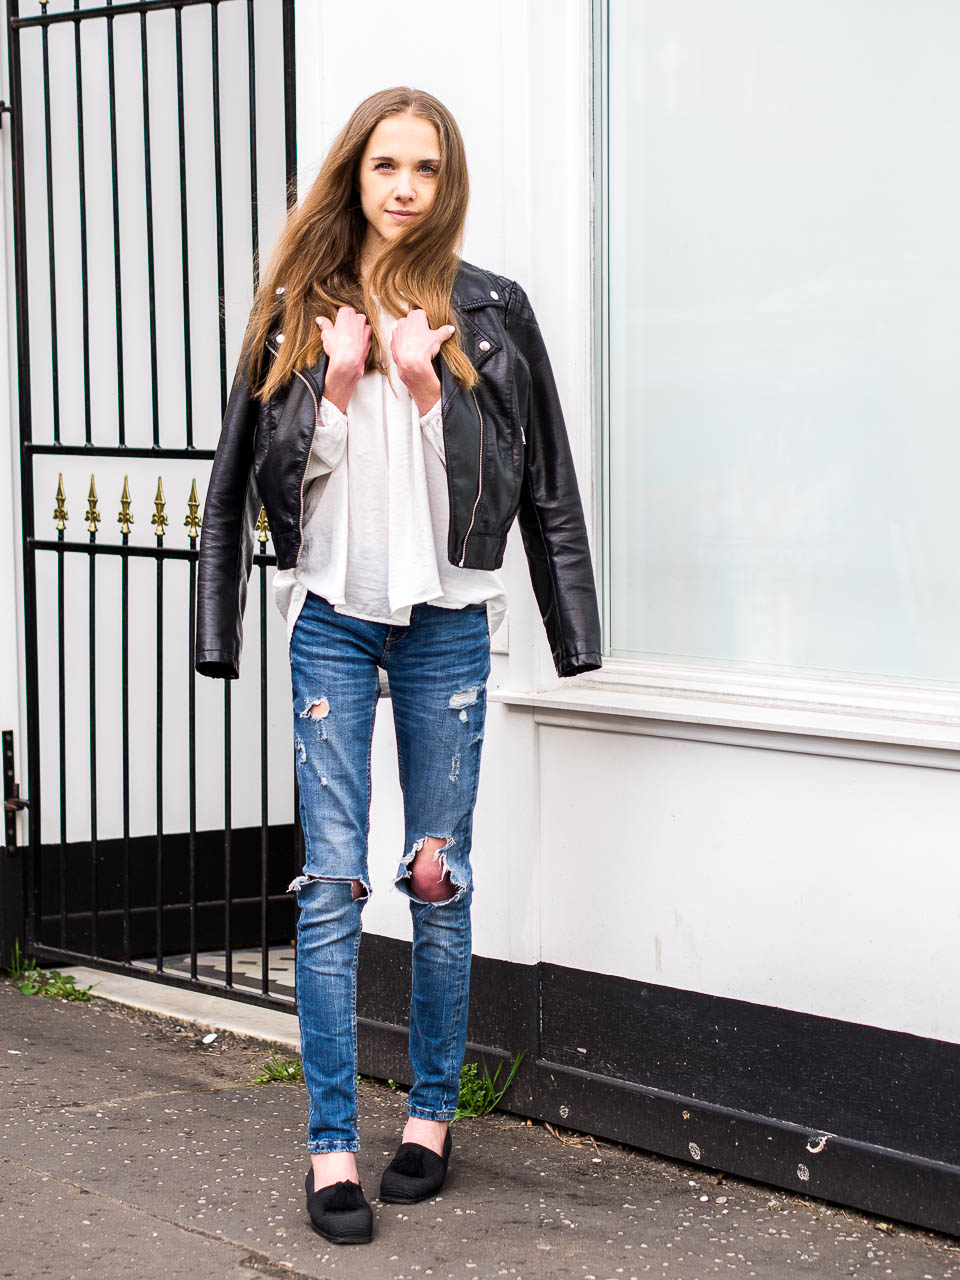 biker-jacket-distressed-jeans-stuart-weitzman-tassel-shoes